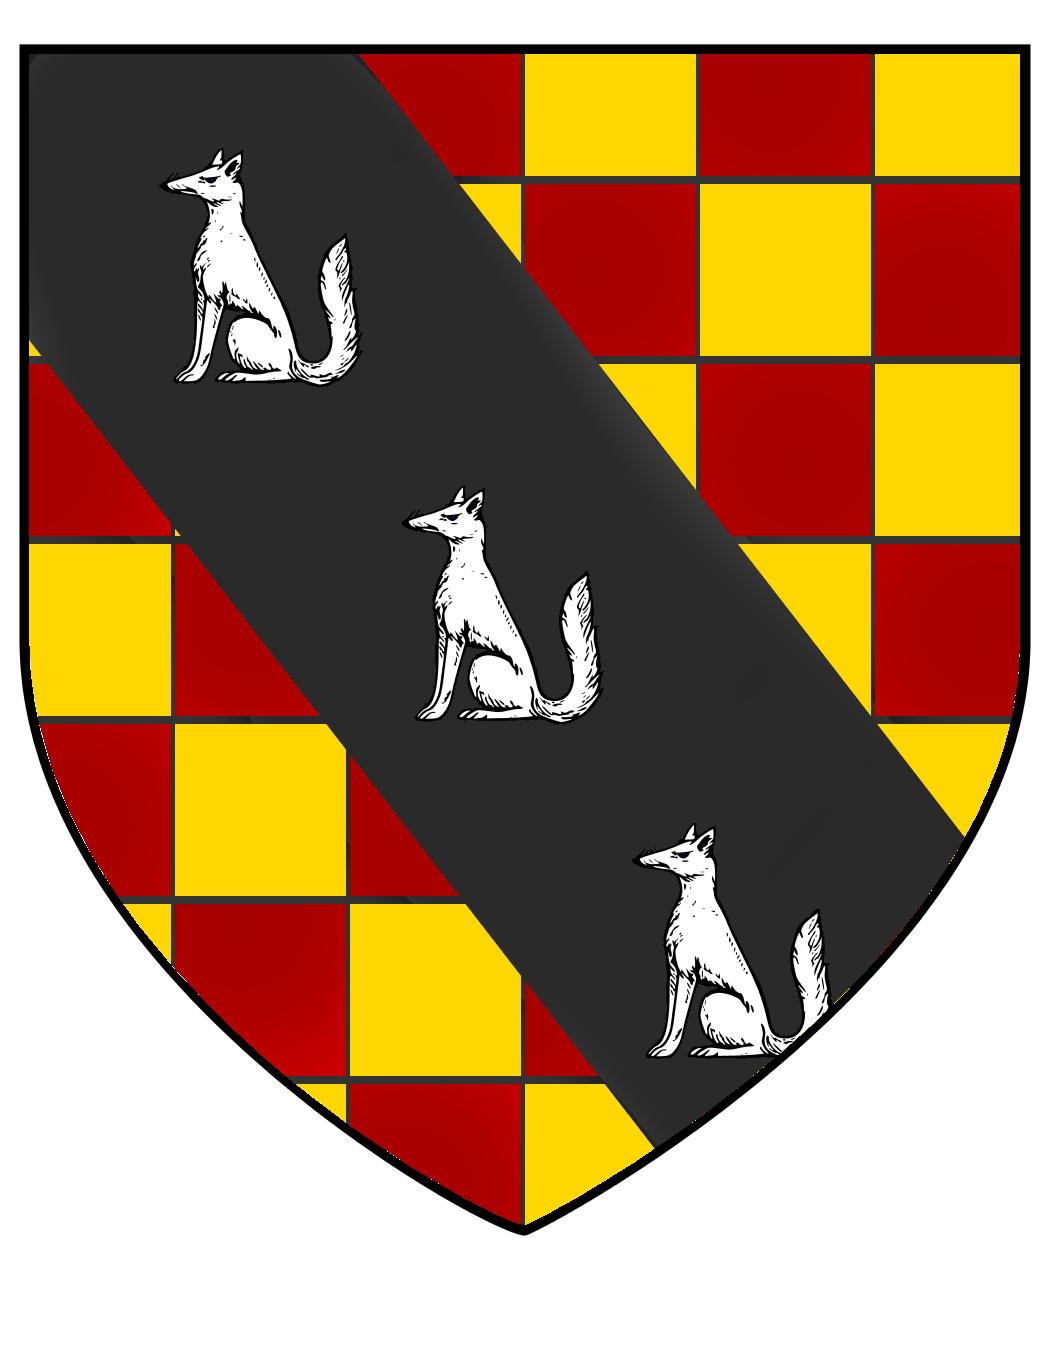 coat_of_arms_Lambert_von_Wurzburg.png